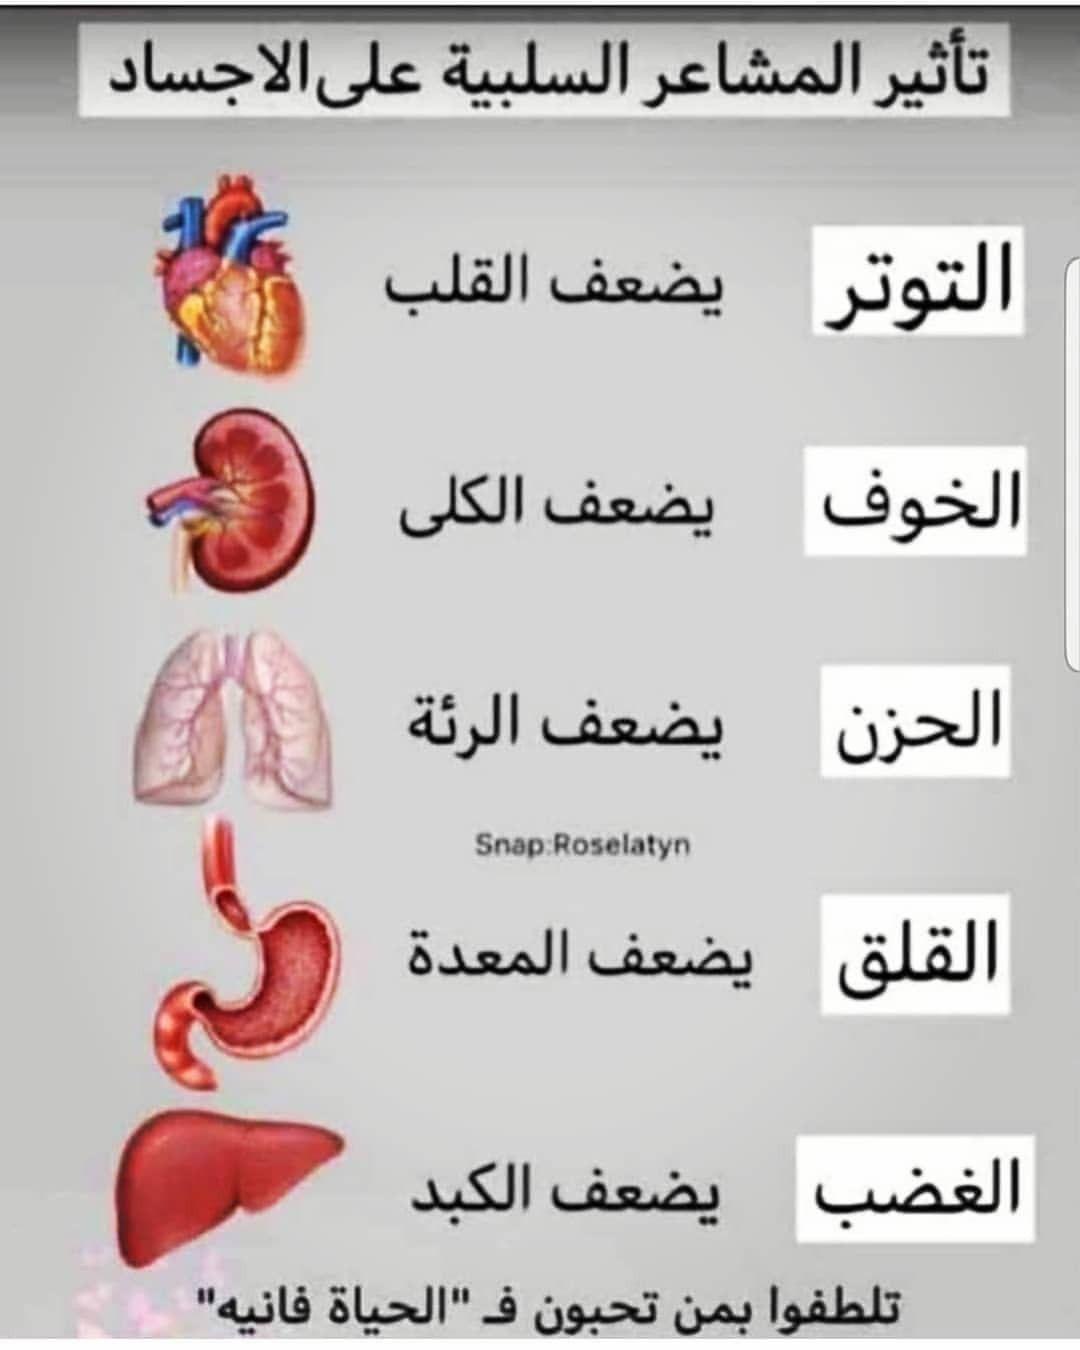 Pin By Roba Alatabani On نصايح Health Advice Health Check Positive Notes